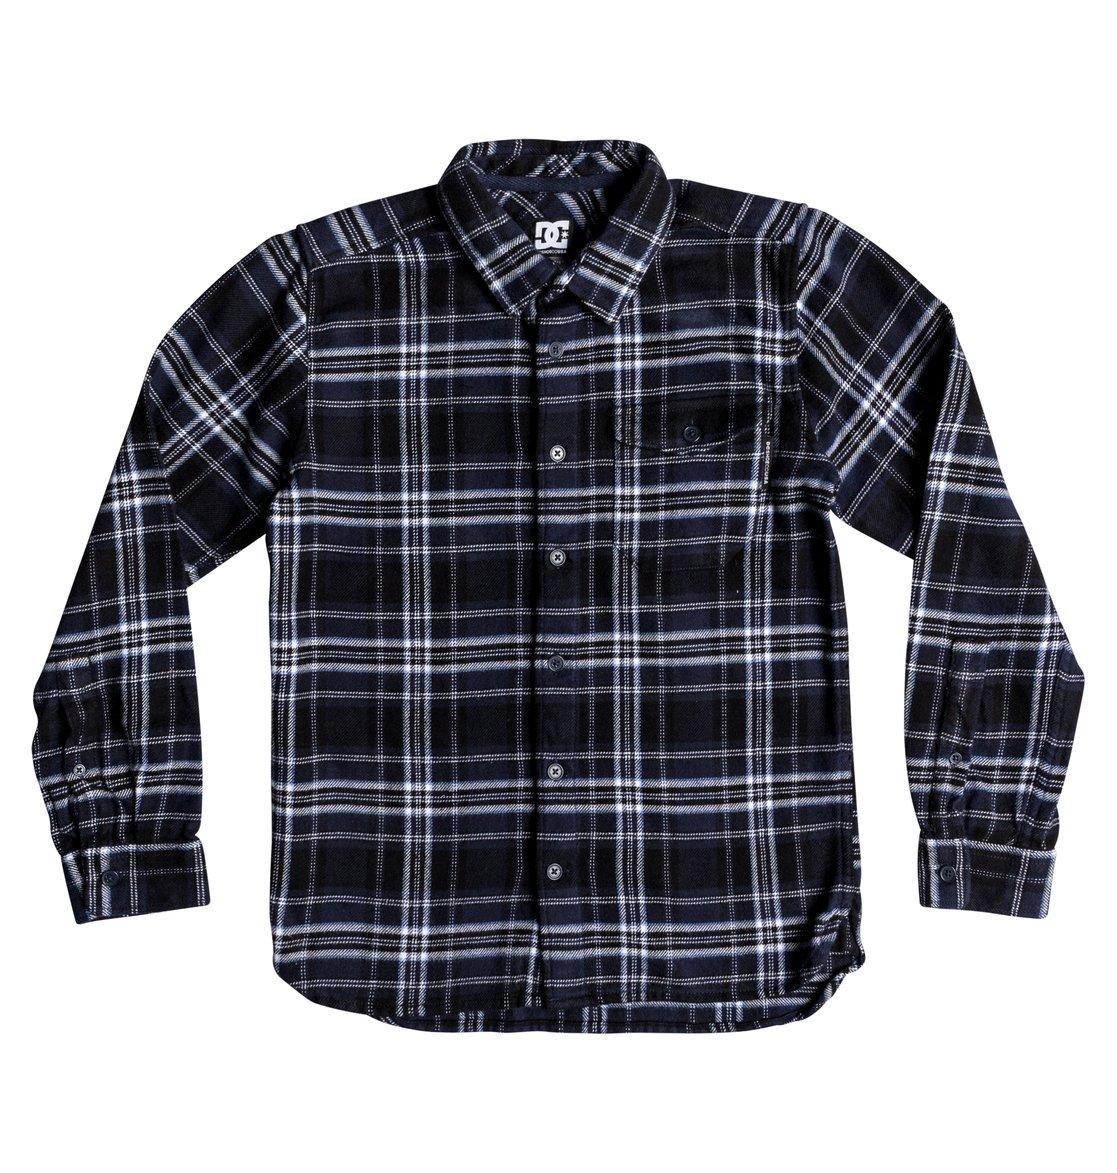 Flanellen Overhemd.Marsha Flanellen Overhemd Met Lange Mouwen Edbwt03047